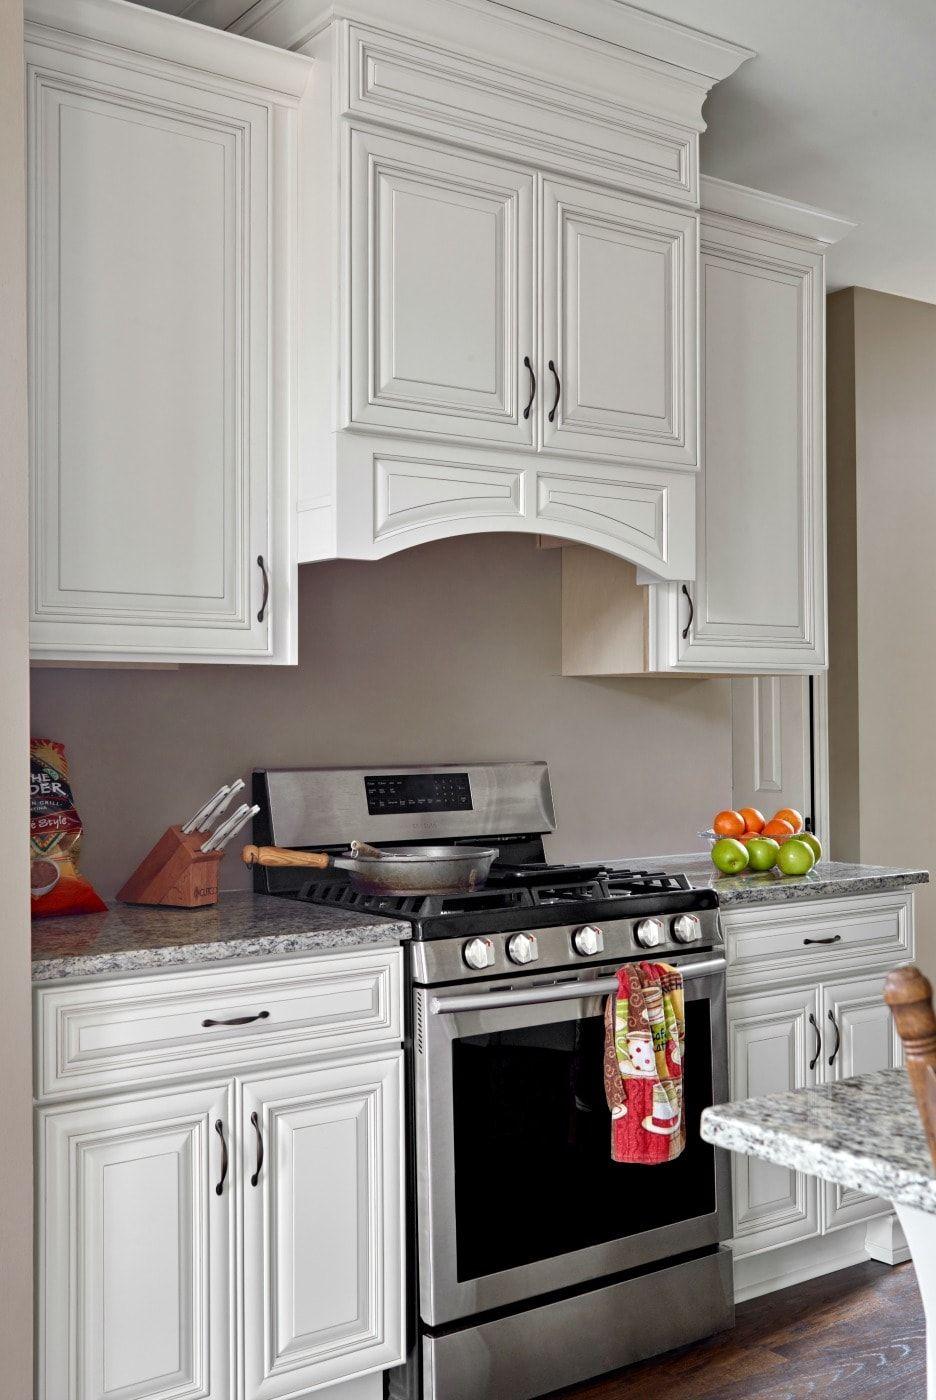 Lexington oatmeal glaze wl light cabinets pinterest oatmeal